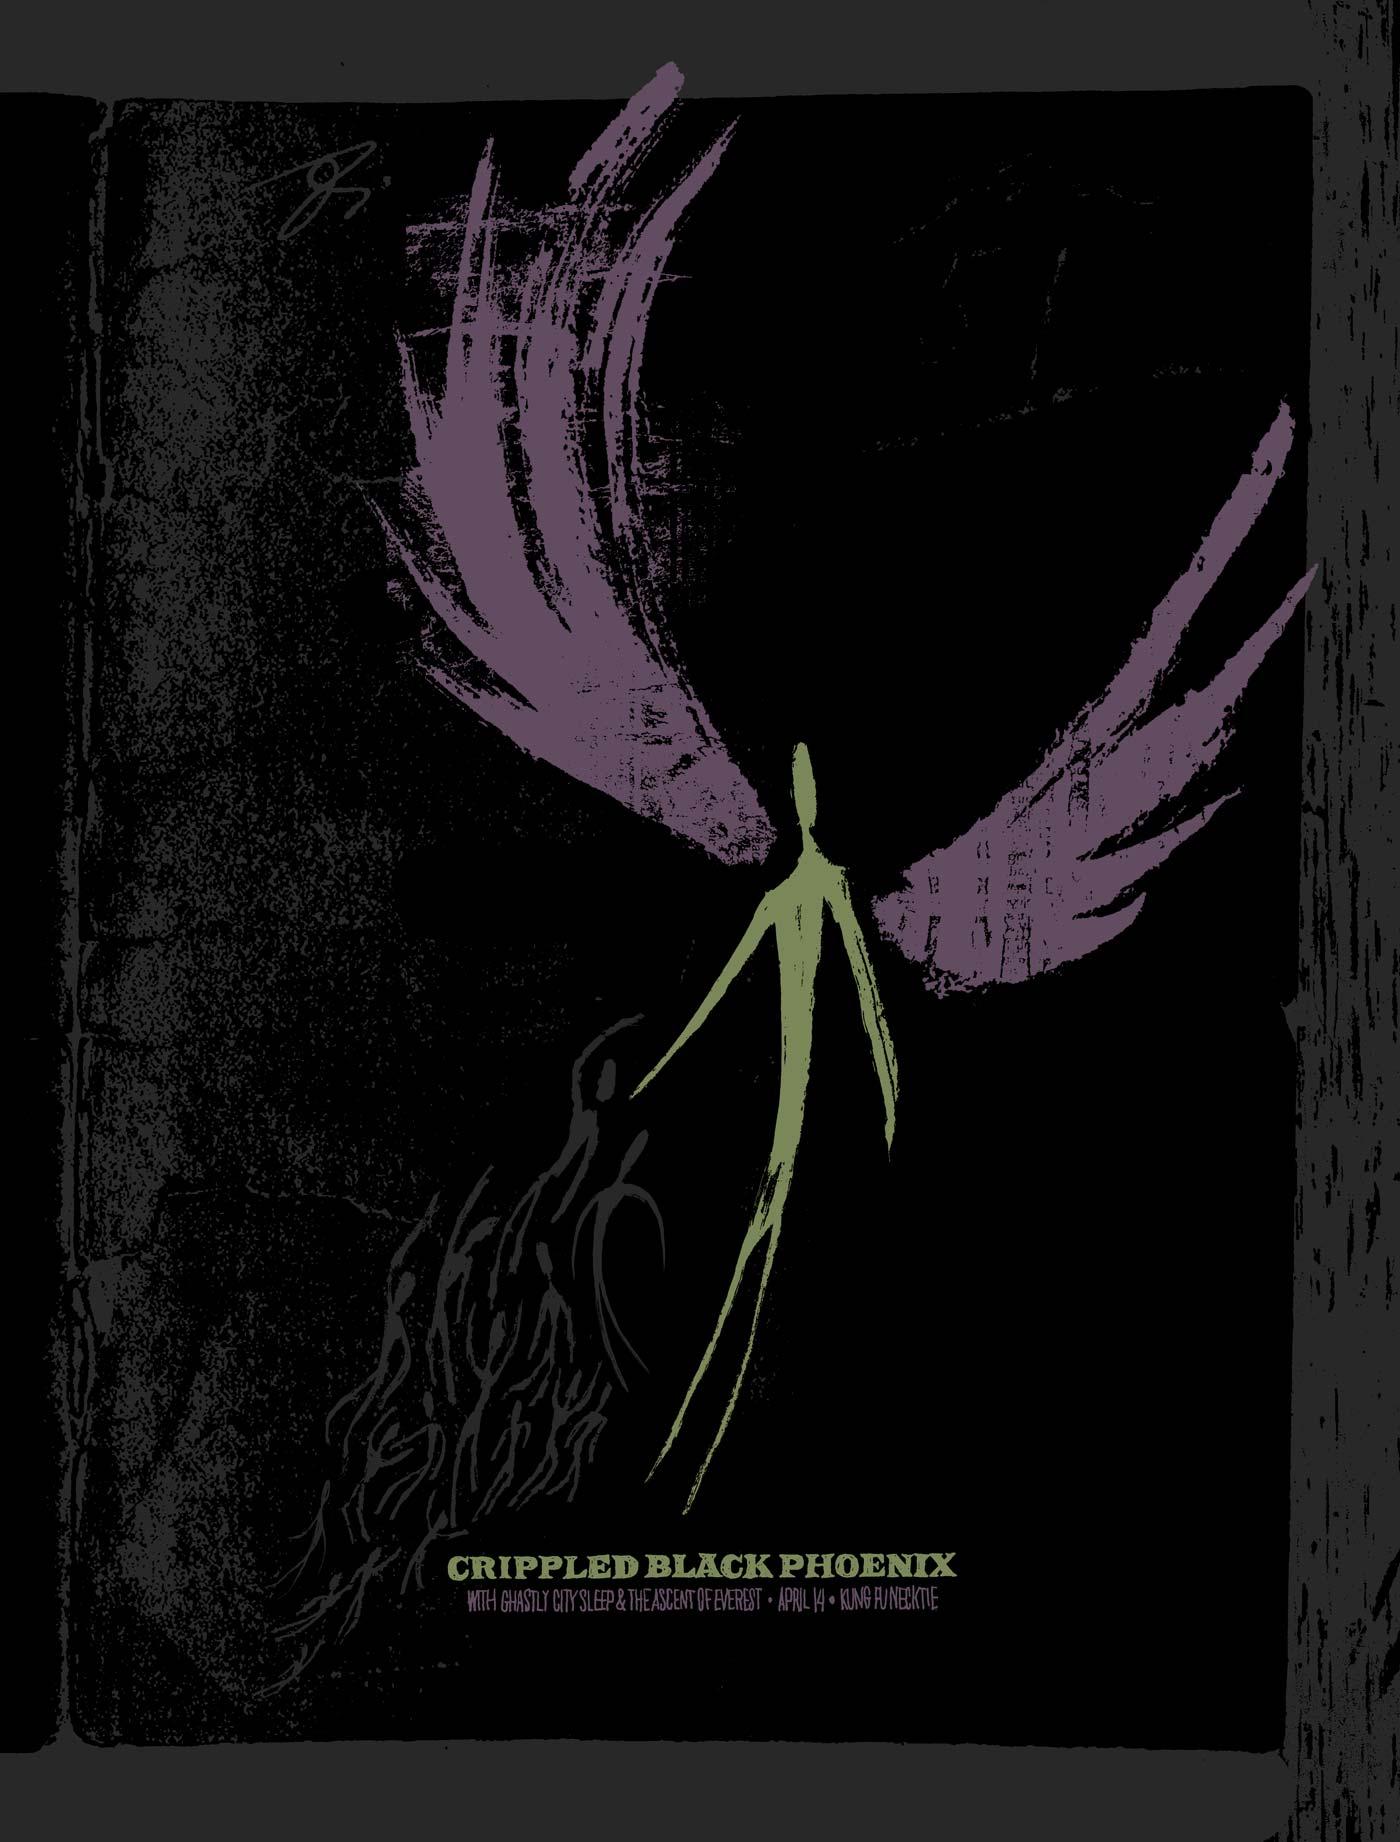 L902_crippled-black-phoenix.jpg